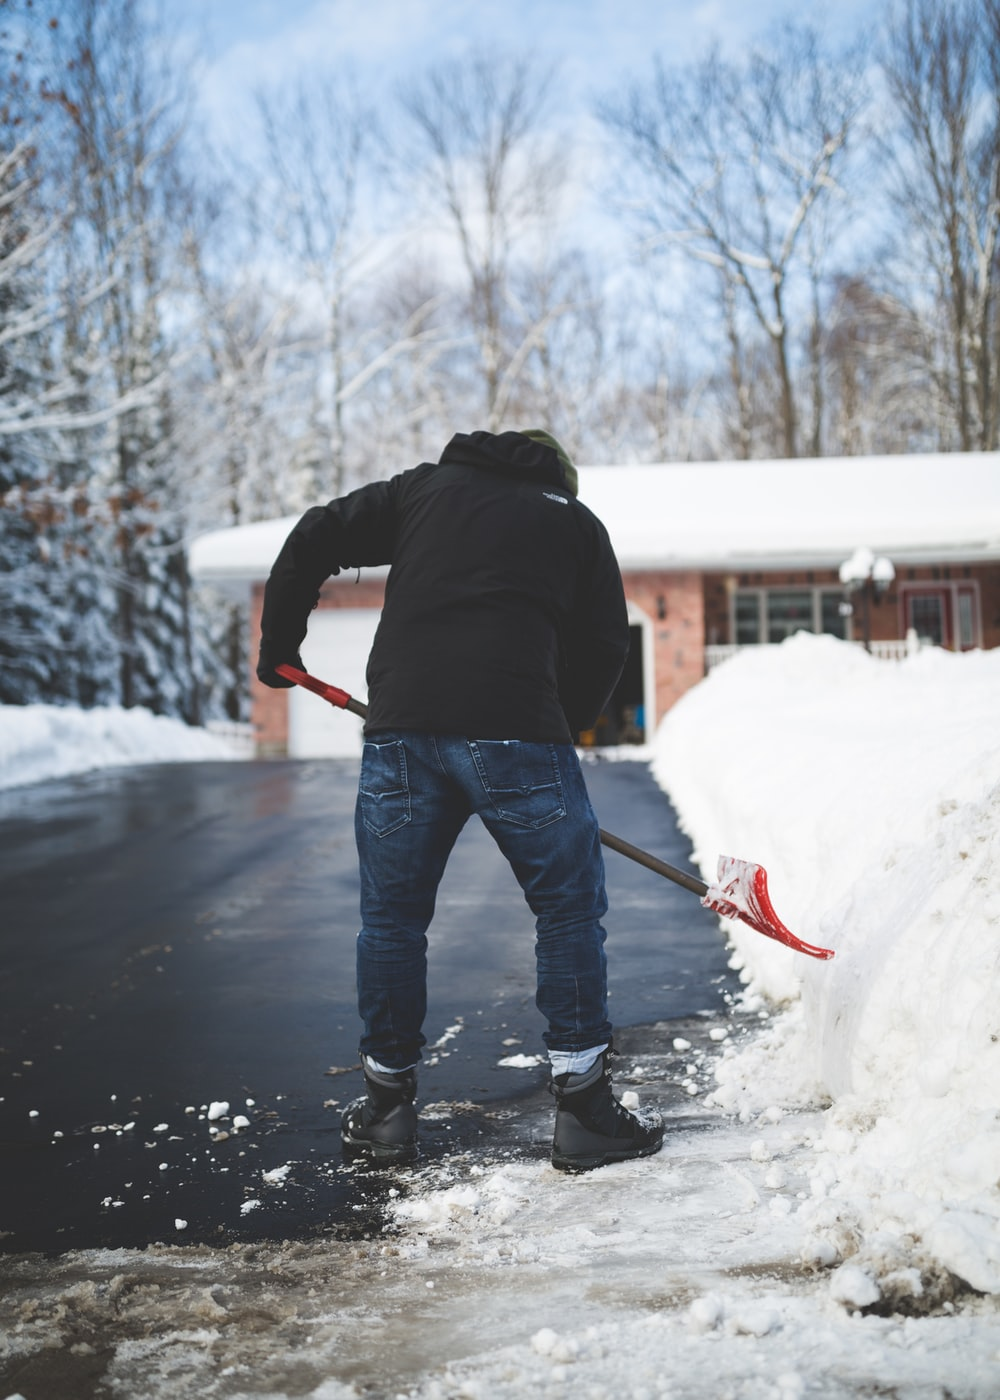 person shoveling snow